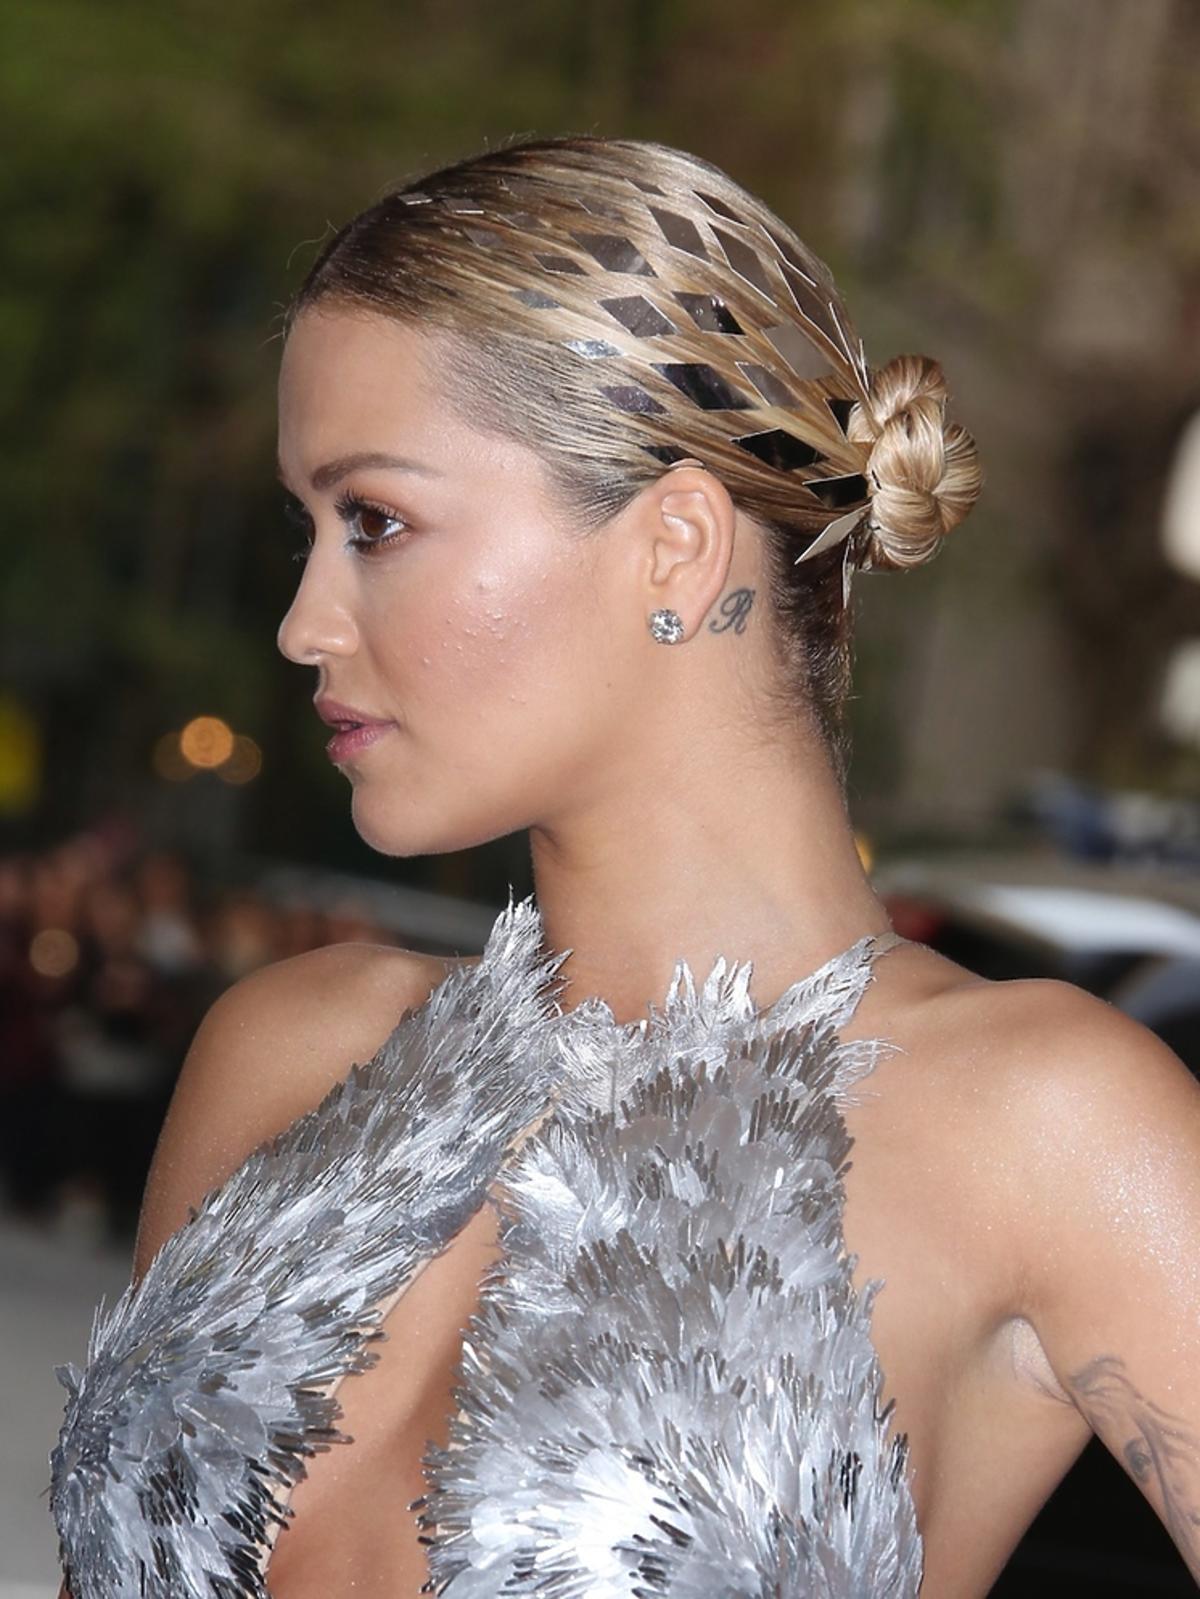 Rita Ora w srebrnej sukience z dekoltem i koku